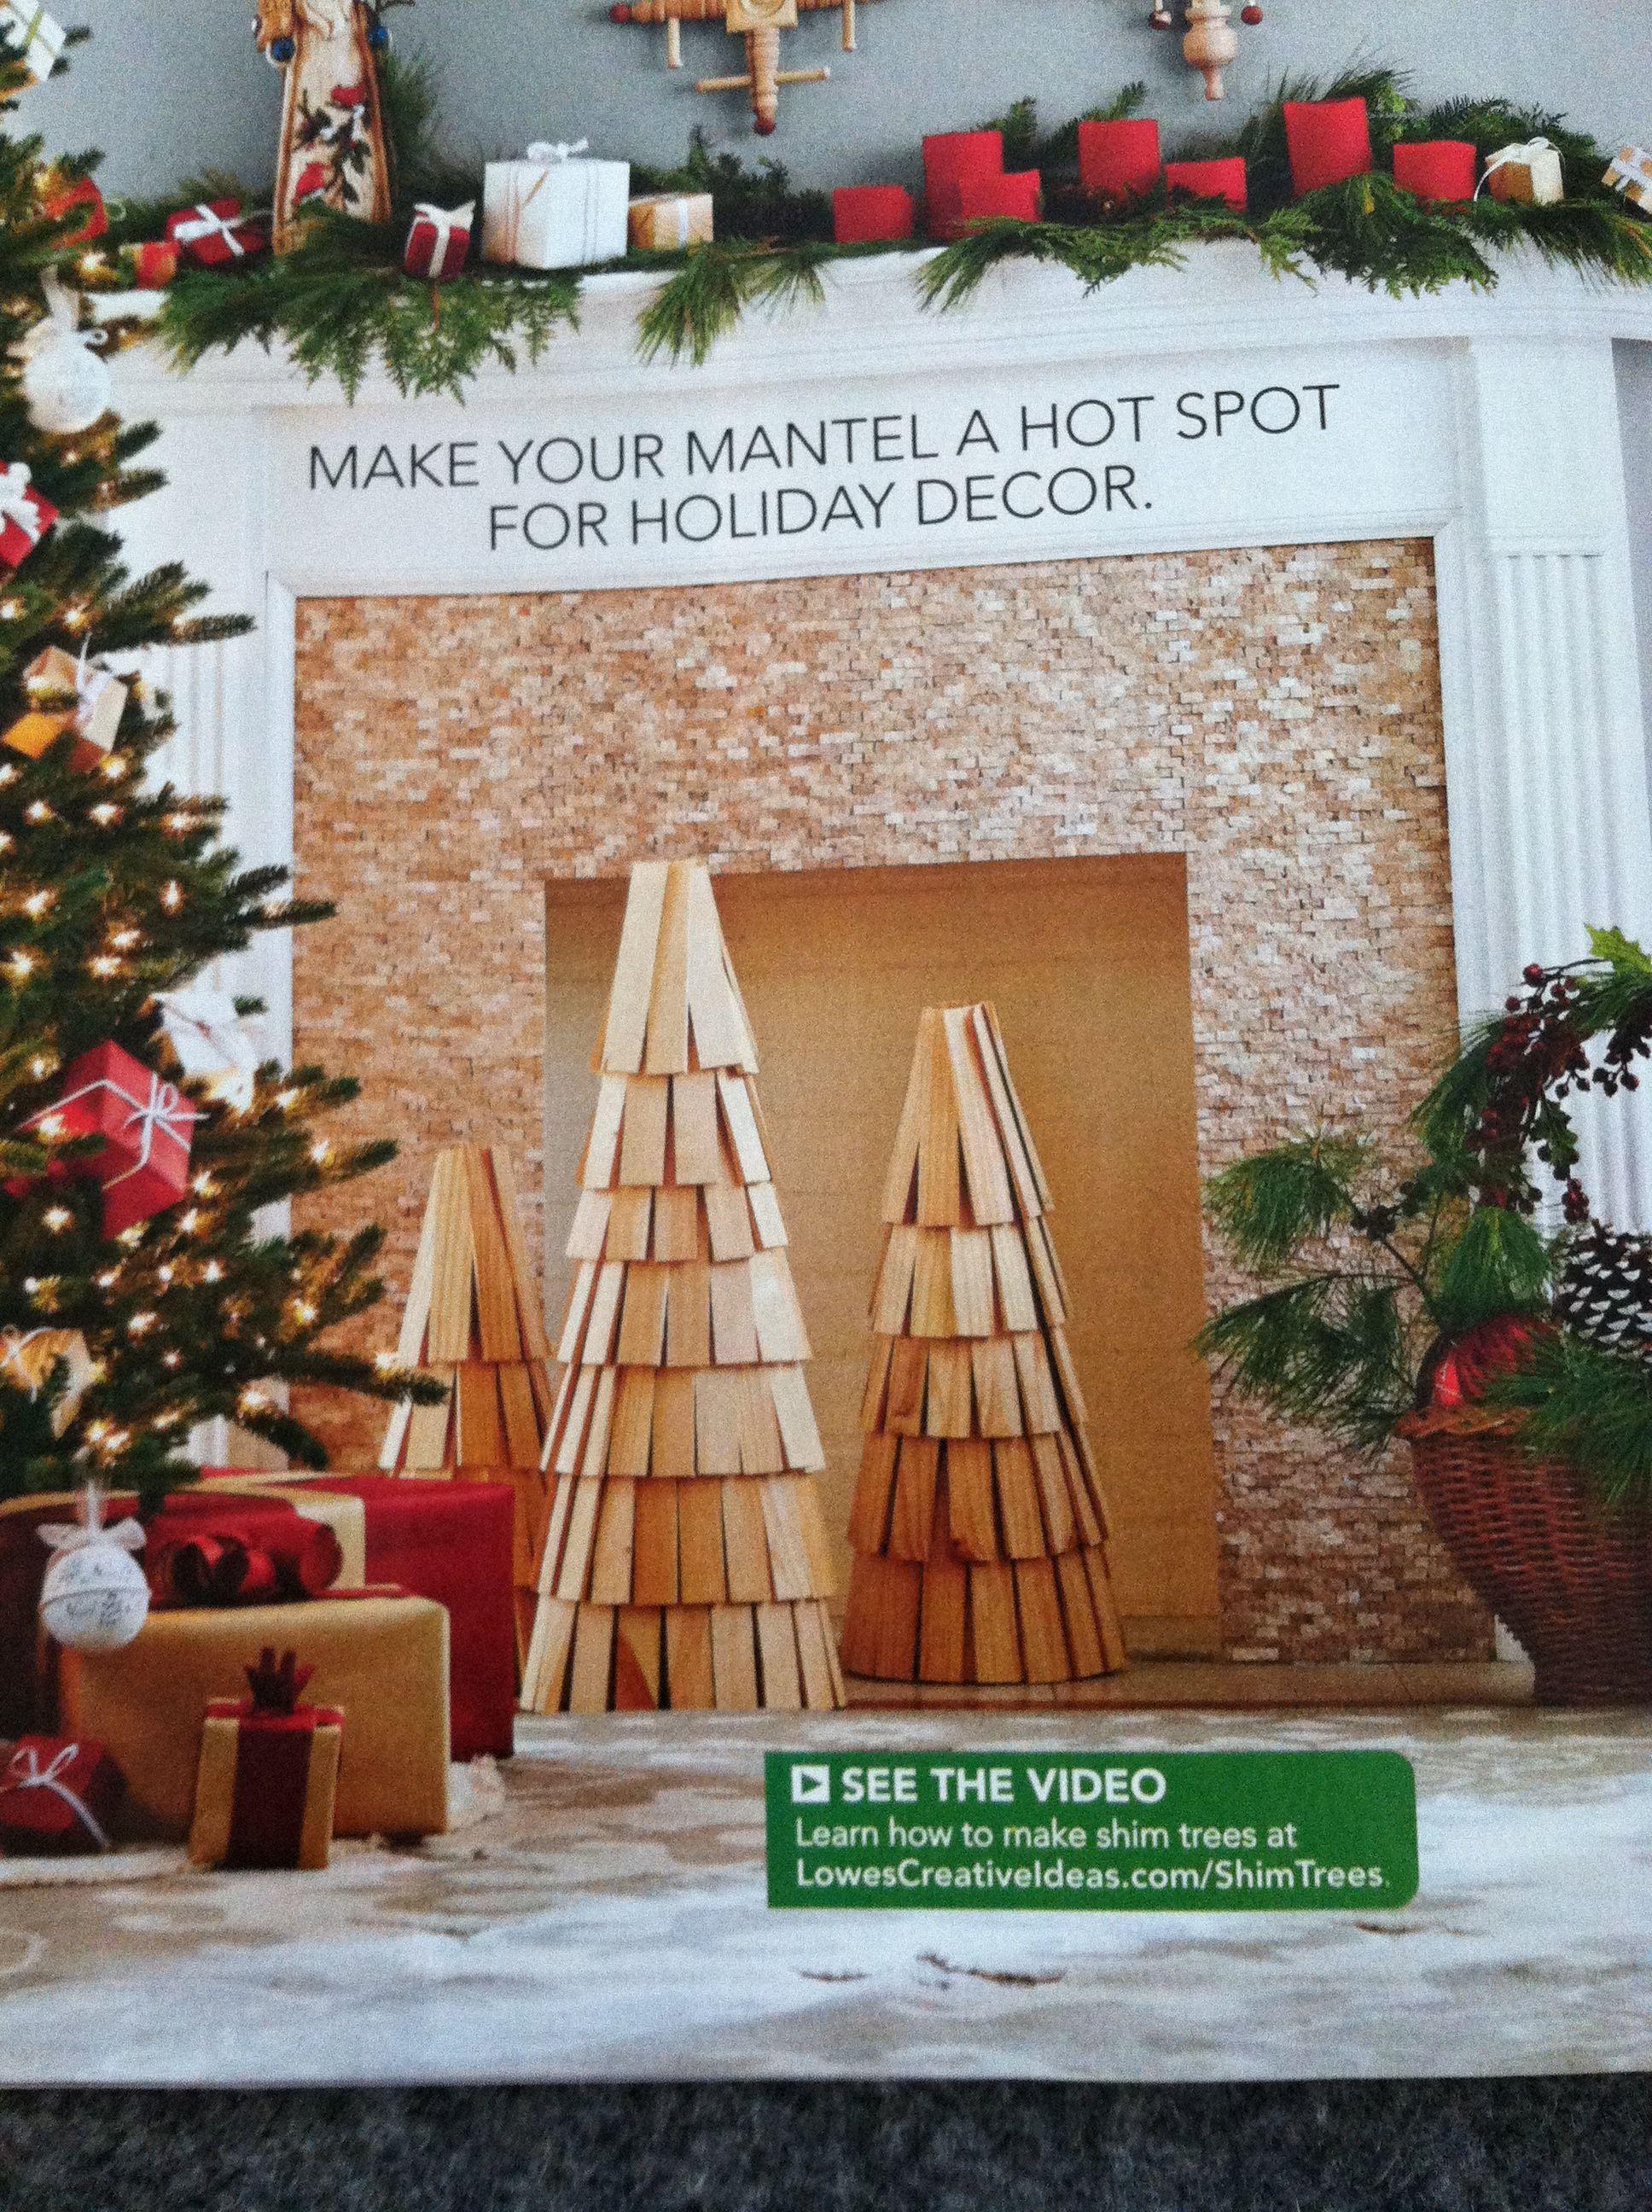 Lowes Creative Ideas shim trees Christmas Pinterest